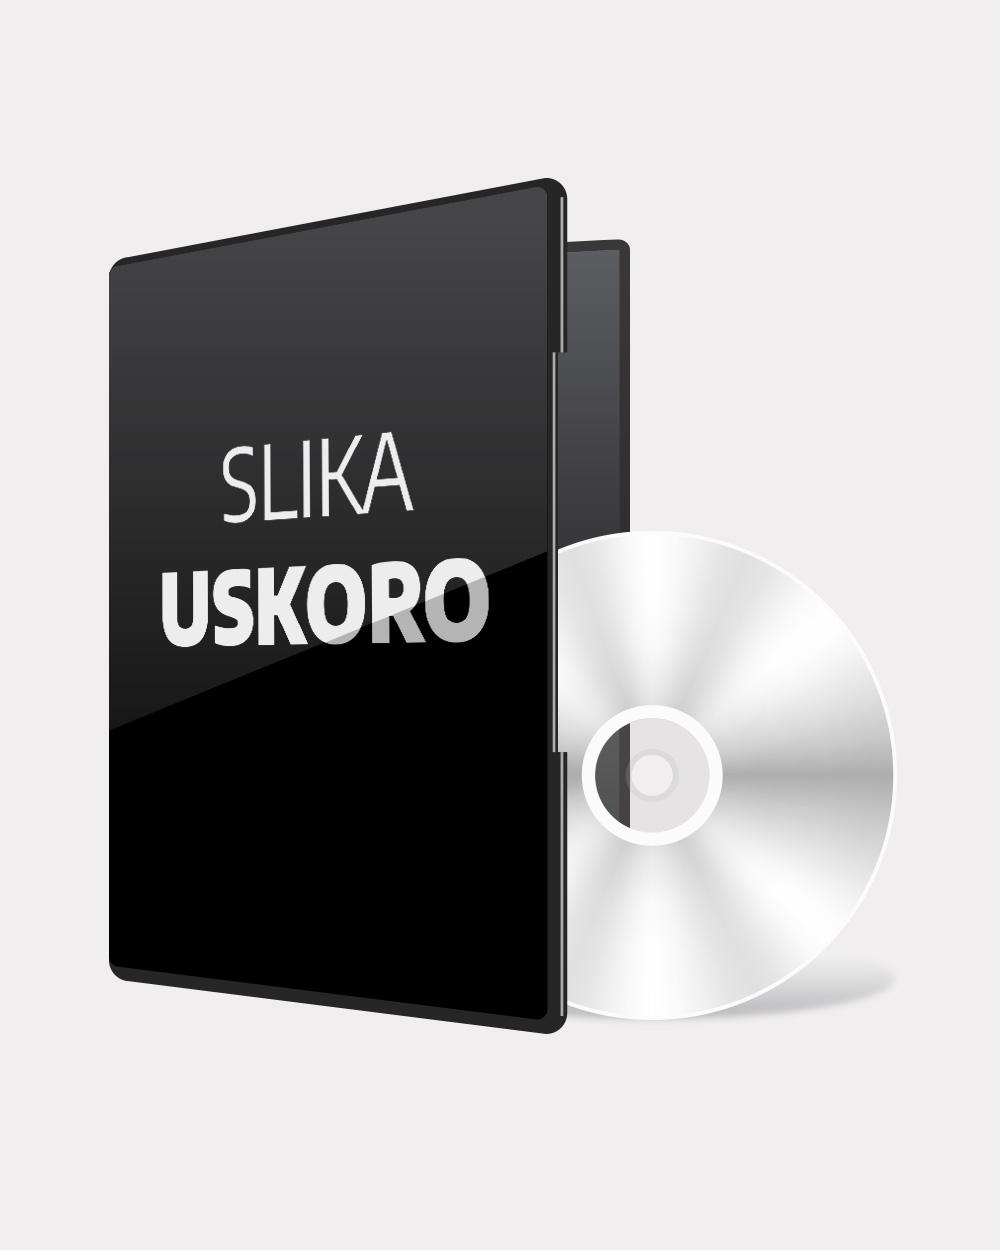 XBOX 360 Call of Duty 4 - Modern Warfare